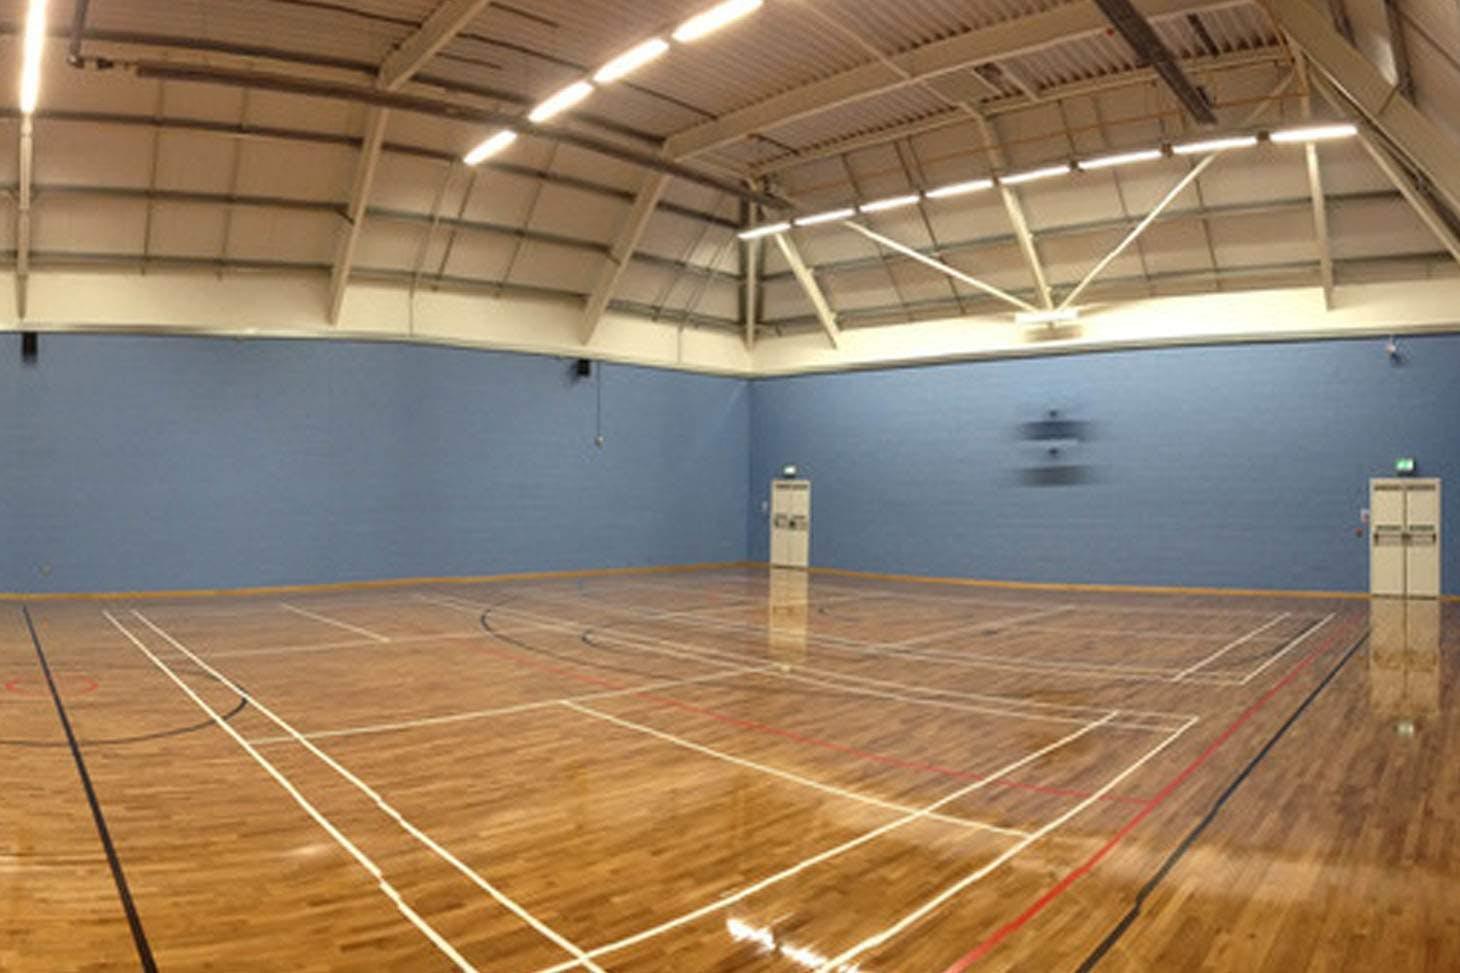 Sutton Coldfield Grammar School for Girls Nets | Indoor cricket facilities